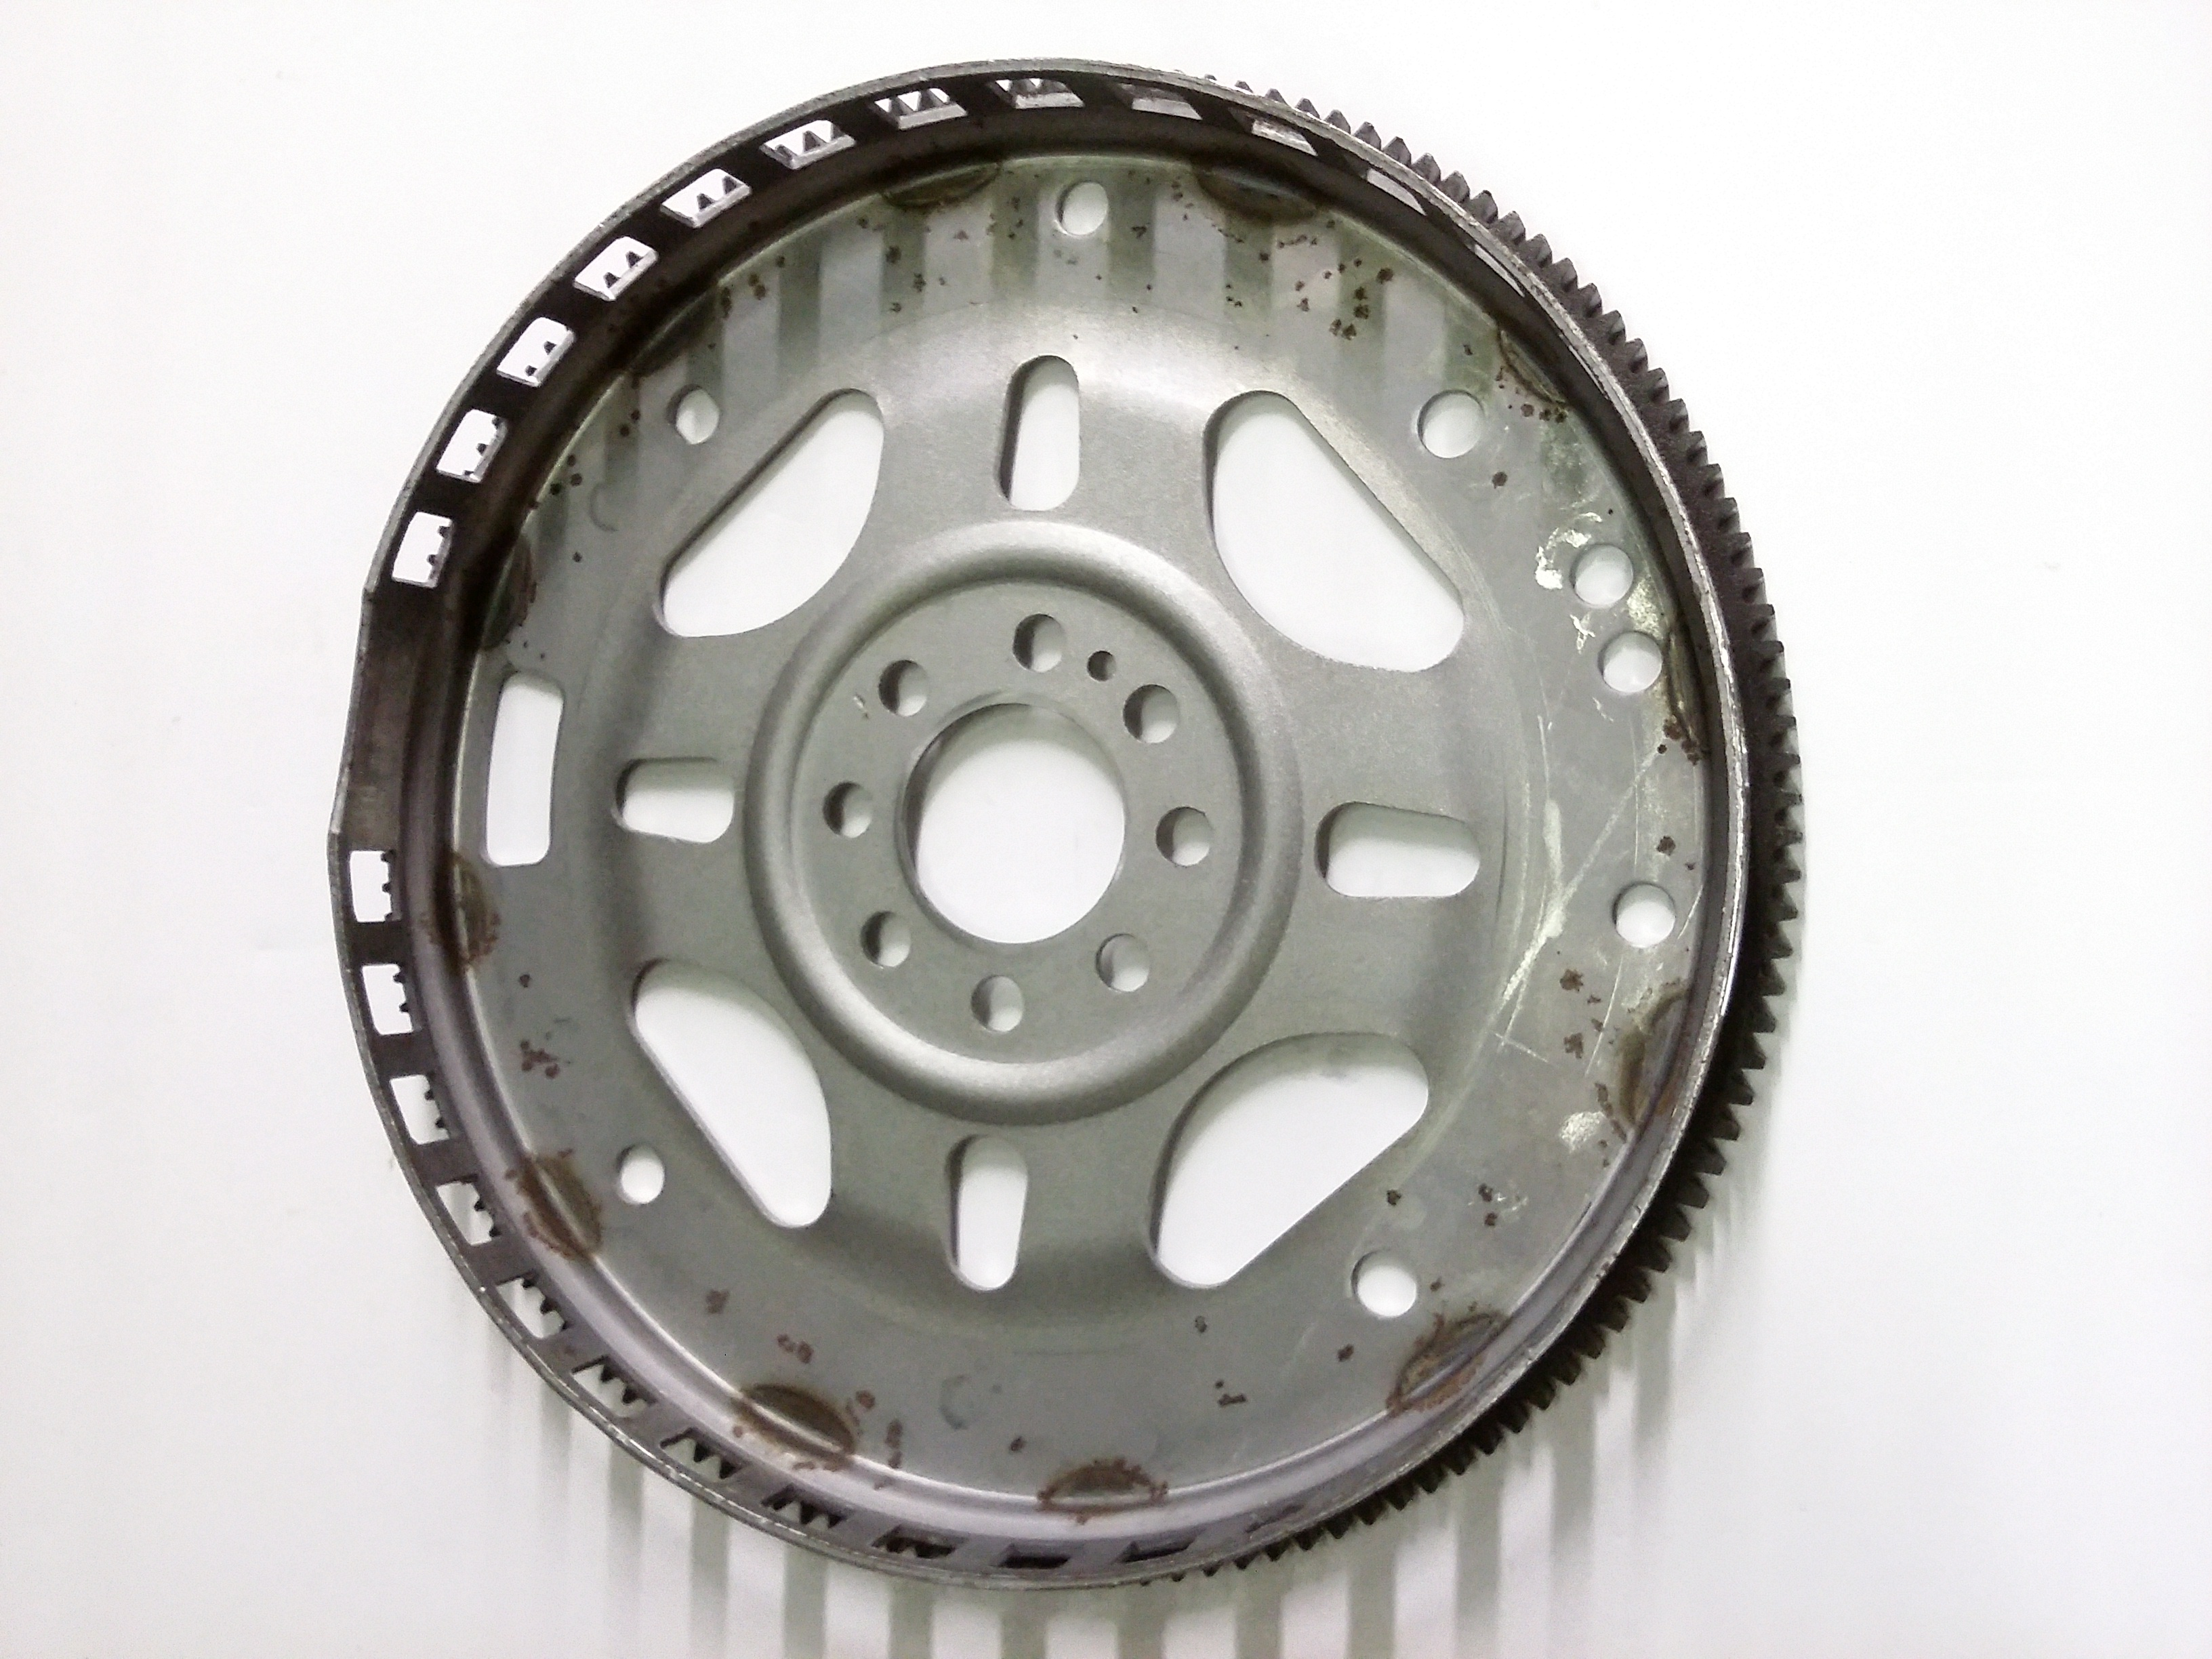 jeep torque converter diagram  jeep  free engine image for 46RE Valve Body Diagram 83 Dodge Ram Transmission Diagram